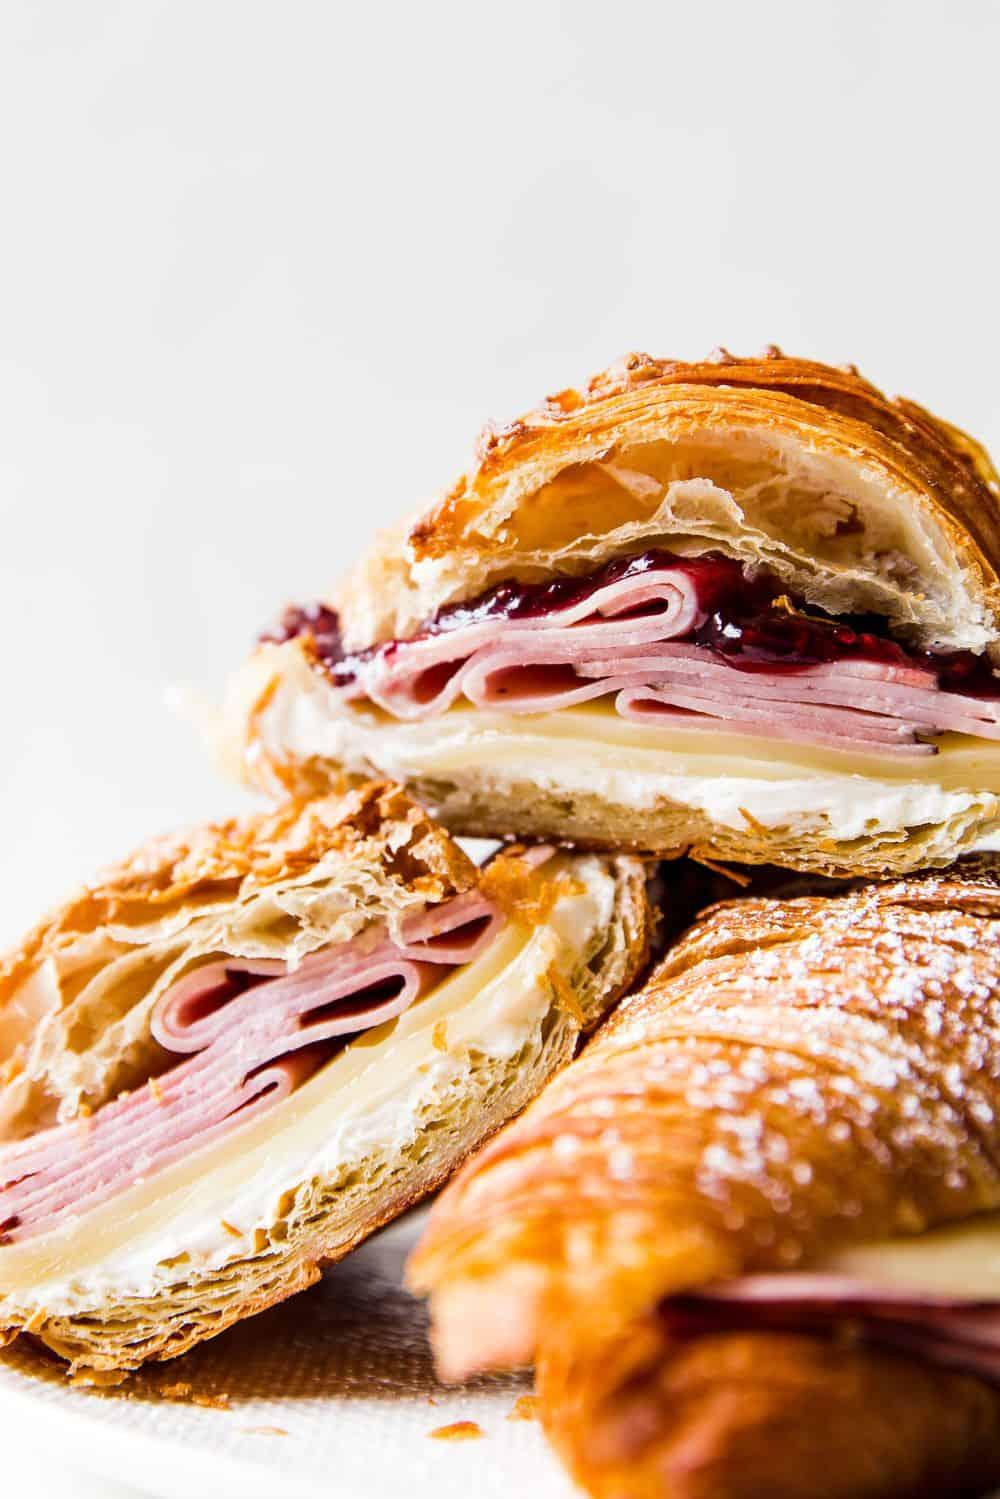 Monte Cristo Croissant Sandwiches stacked.